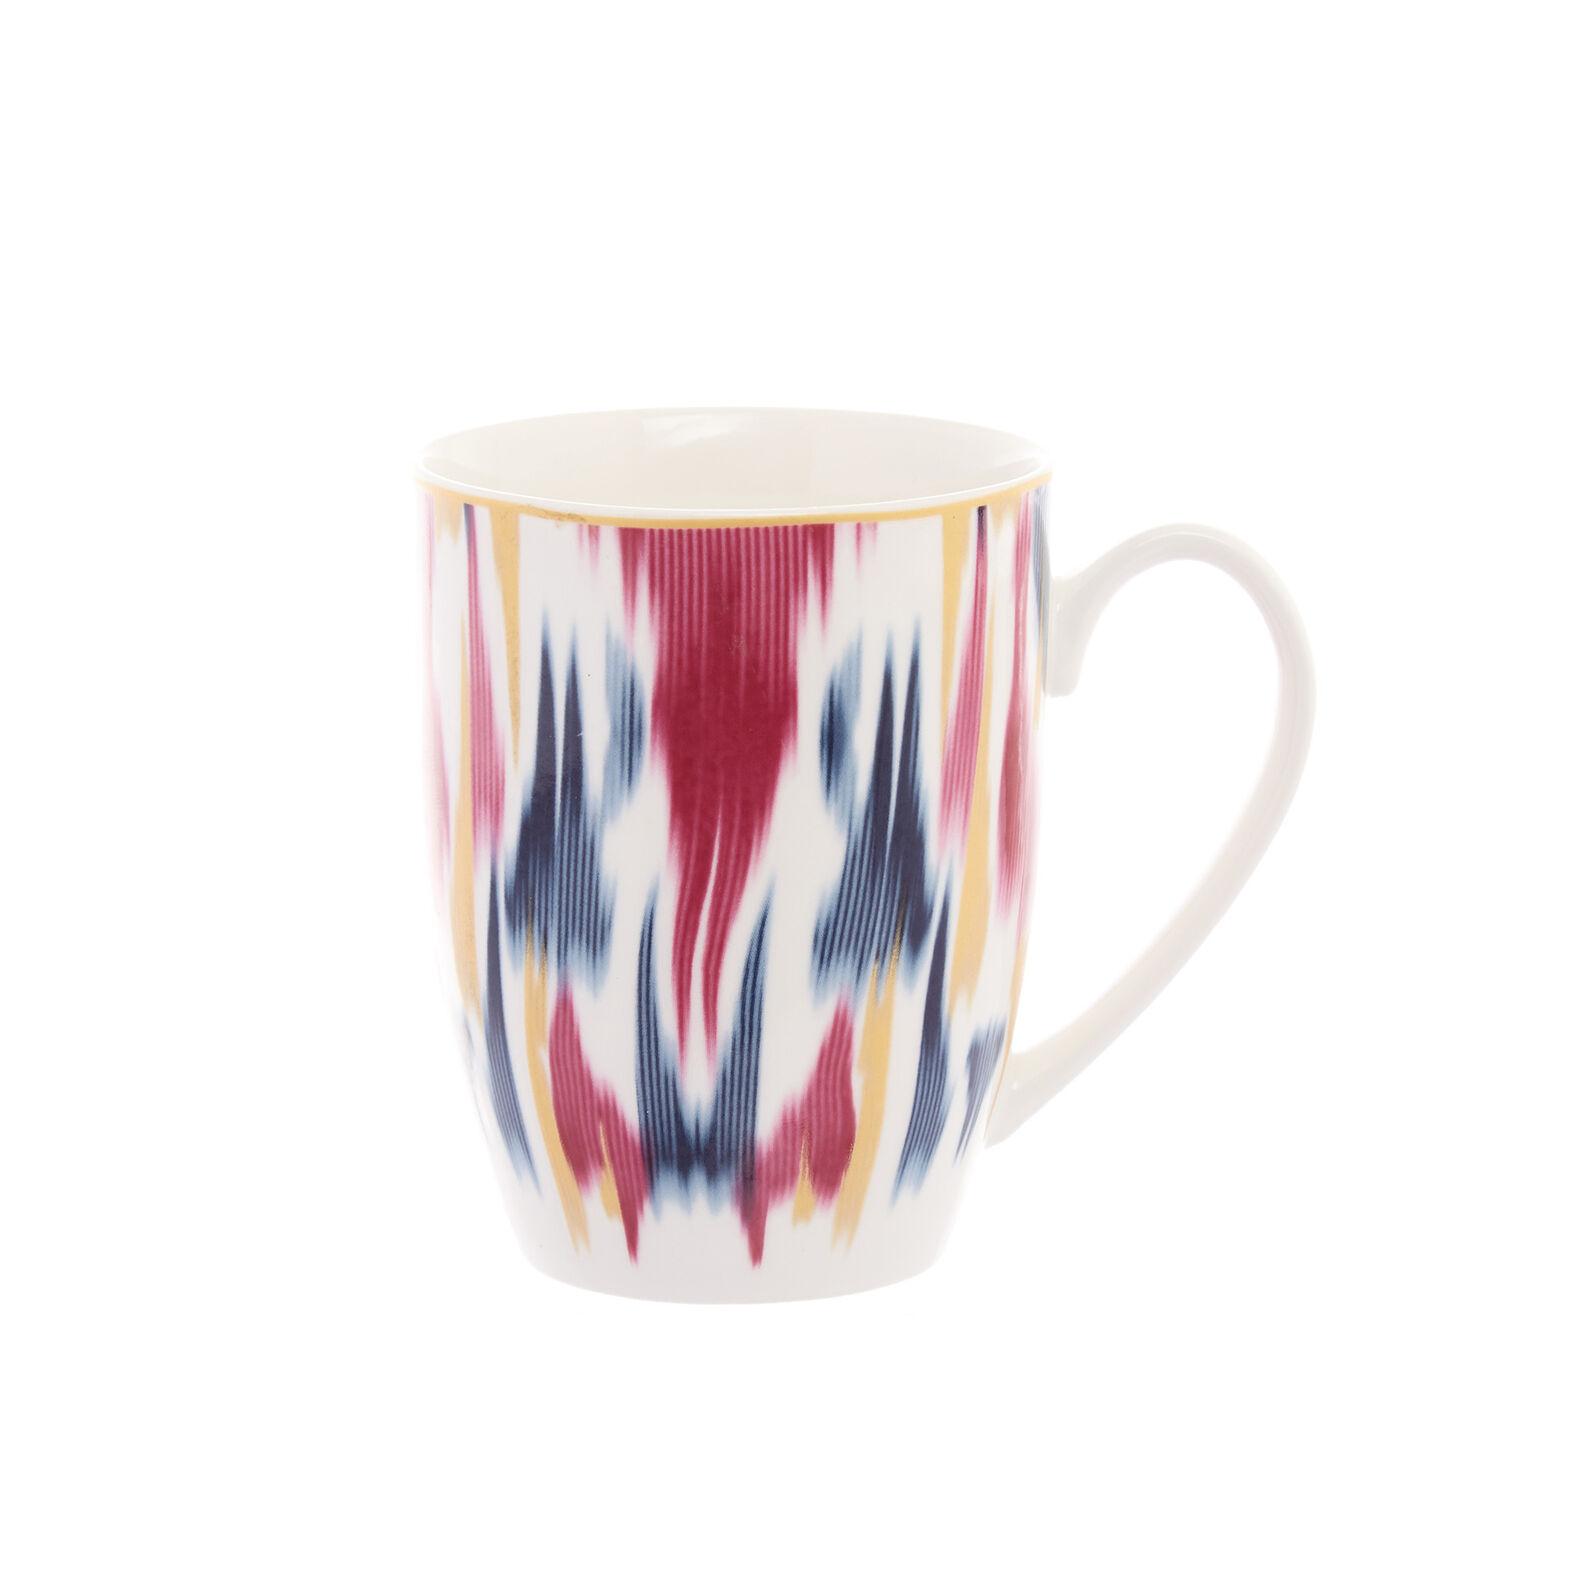 Mug new bone china motivo ikat